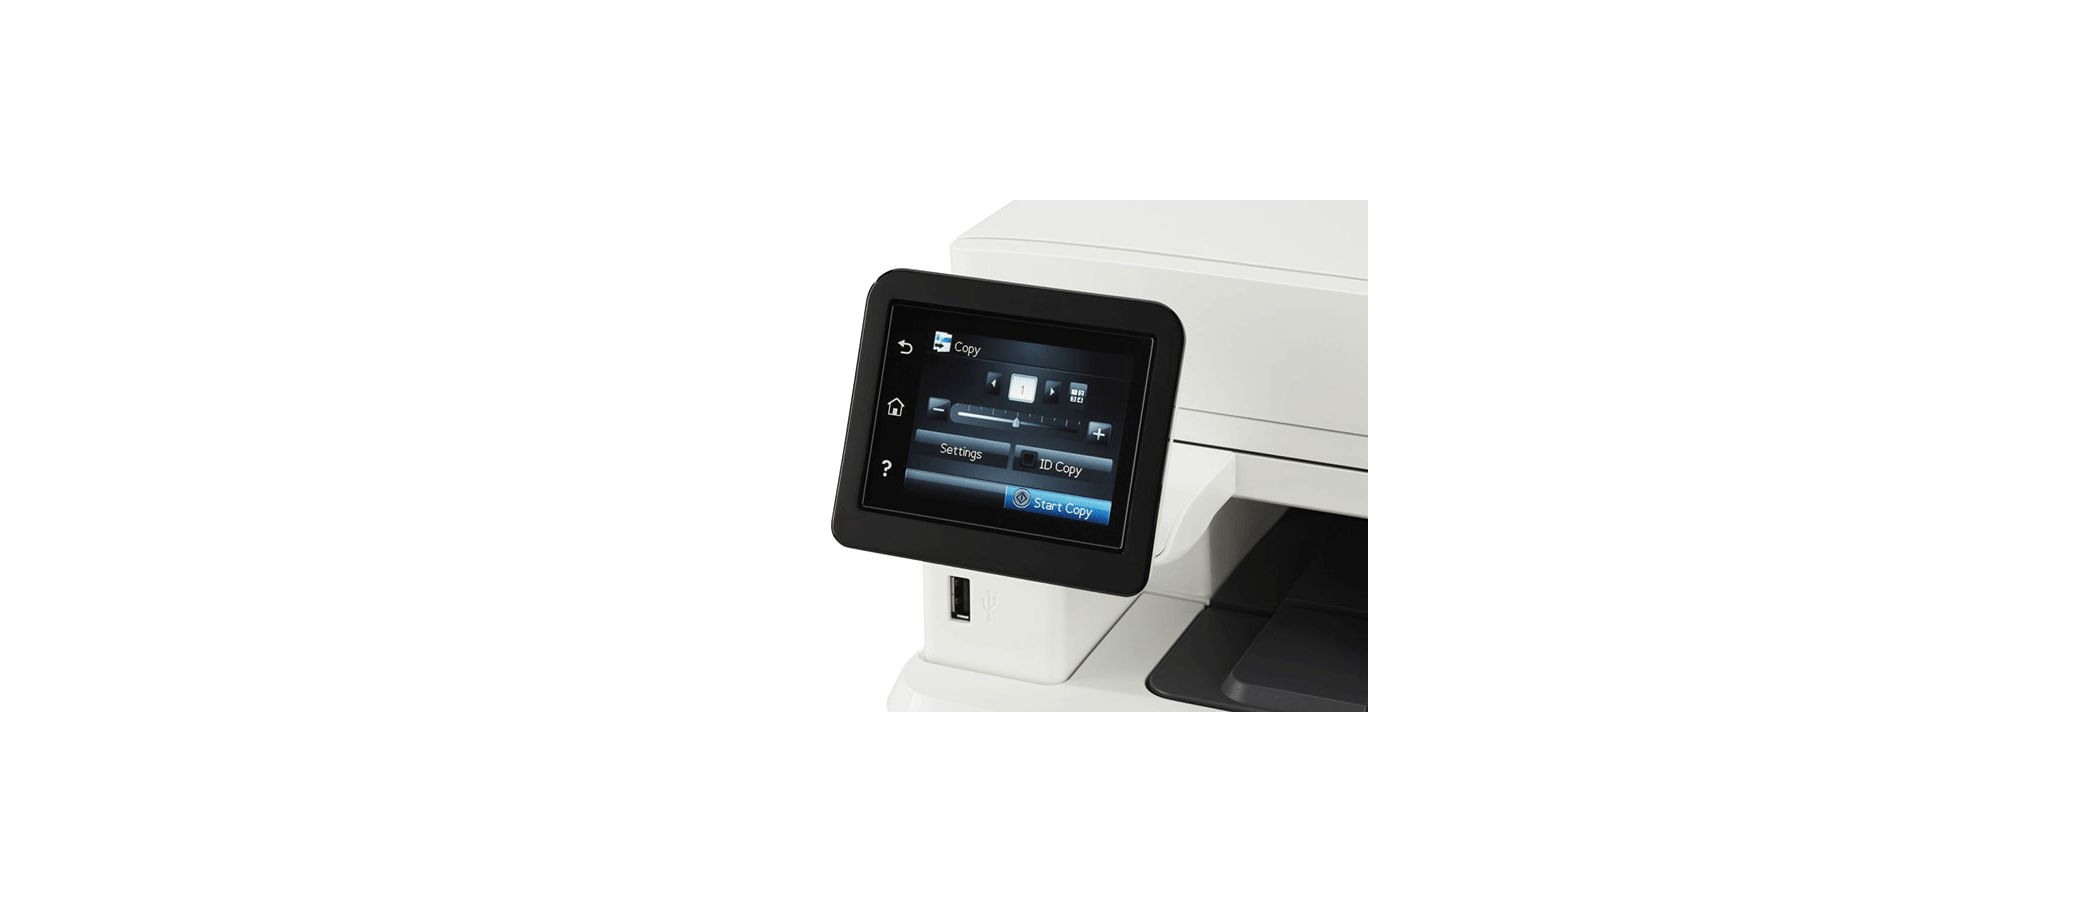 تصویر صفحه نمایش لمسی رنگی 3 اینچی مشخصات پرینتر 426fdn اچ پی